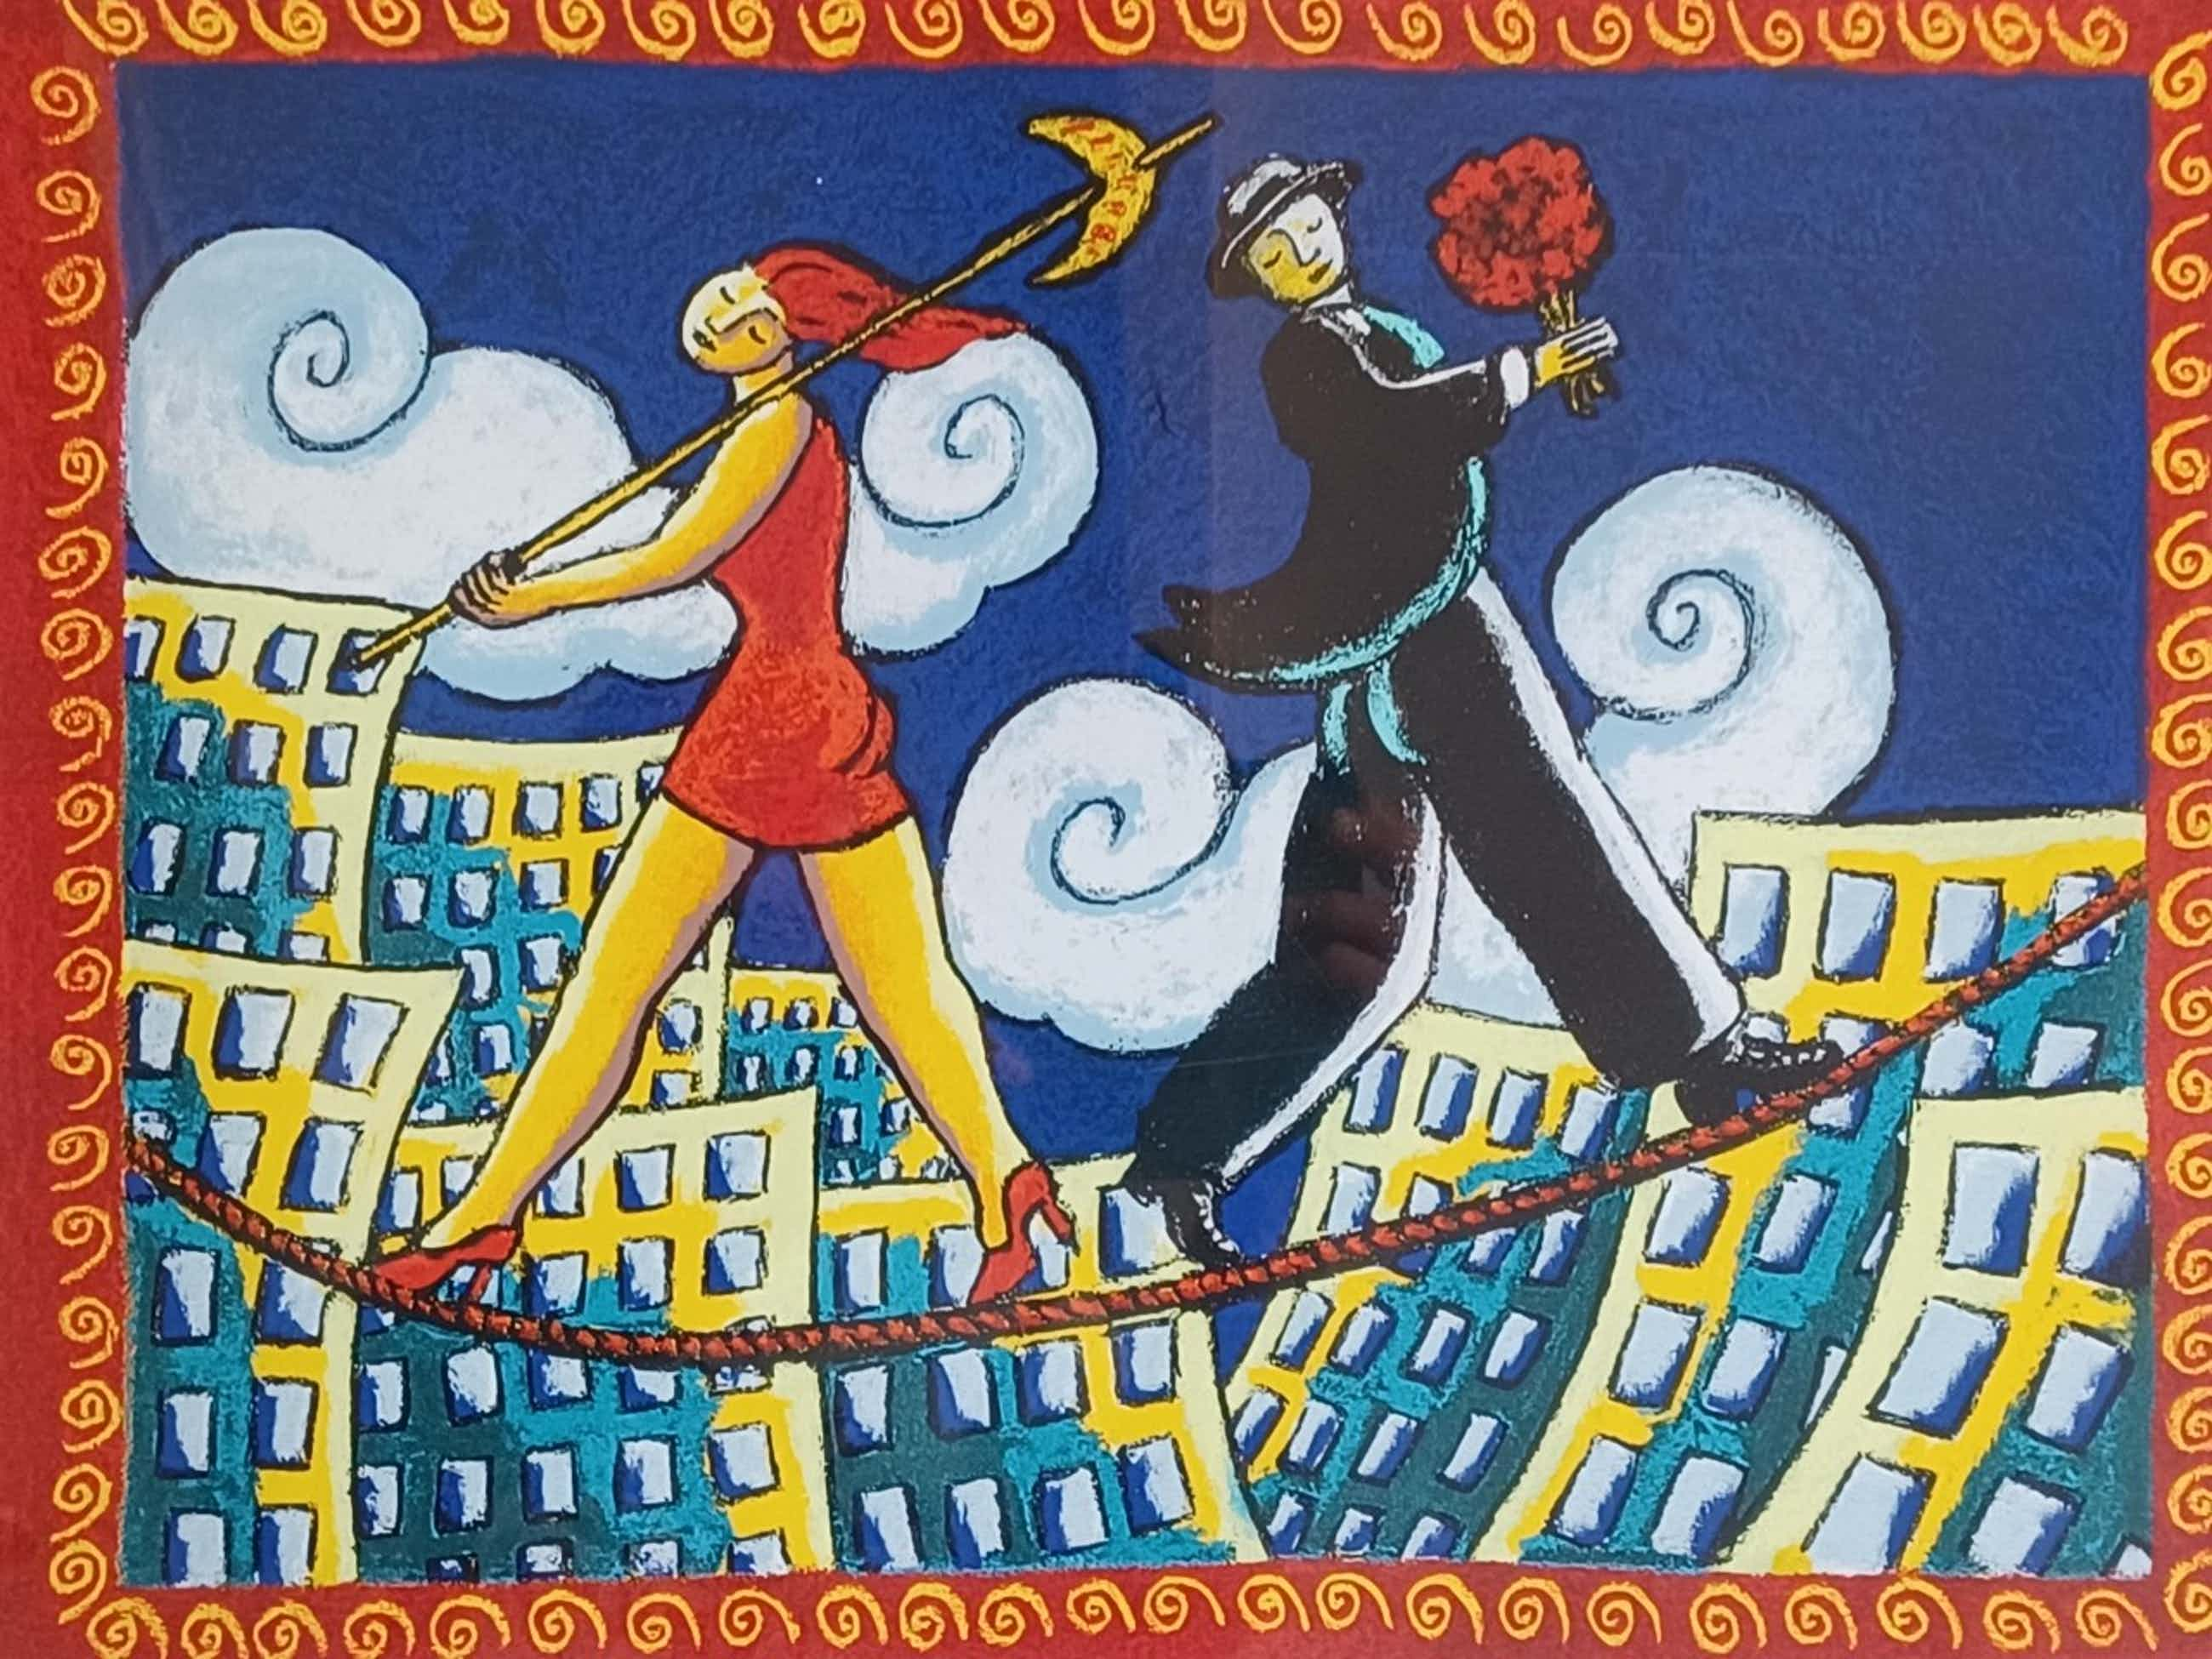 Jacques Tange - 'A very short romance'. kopen? Bied vanaf 75!